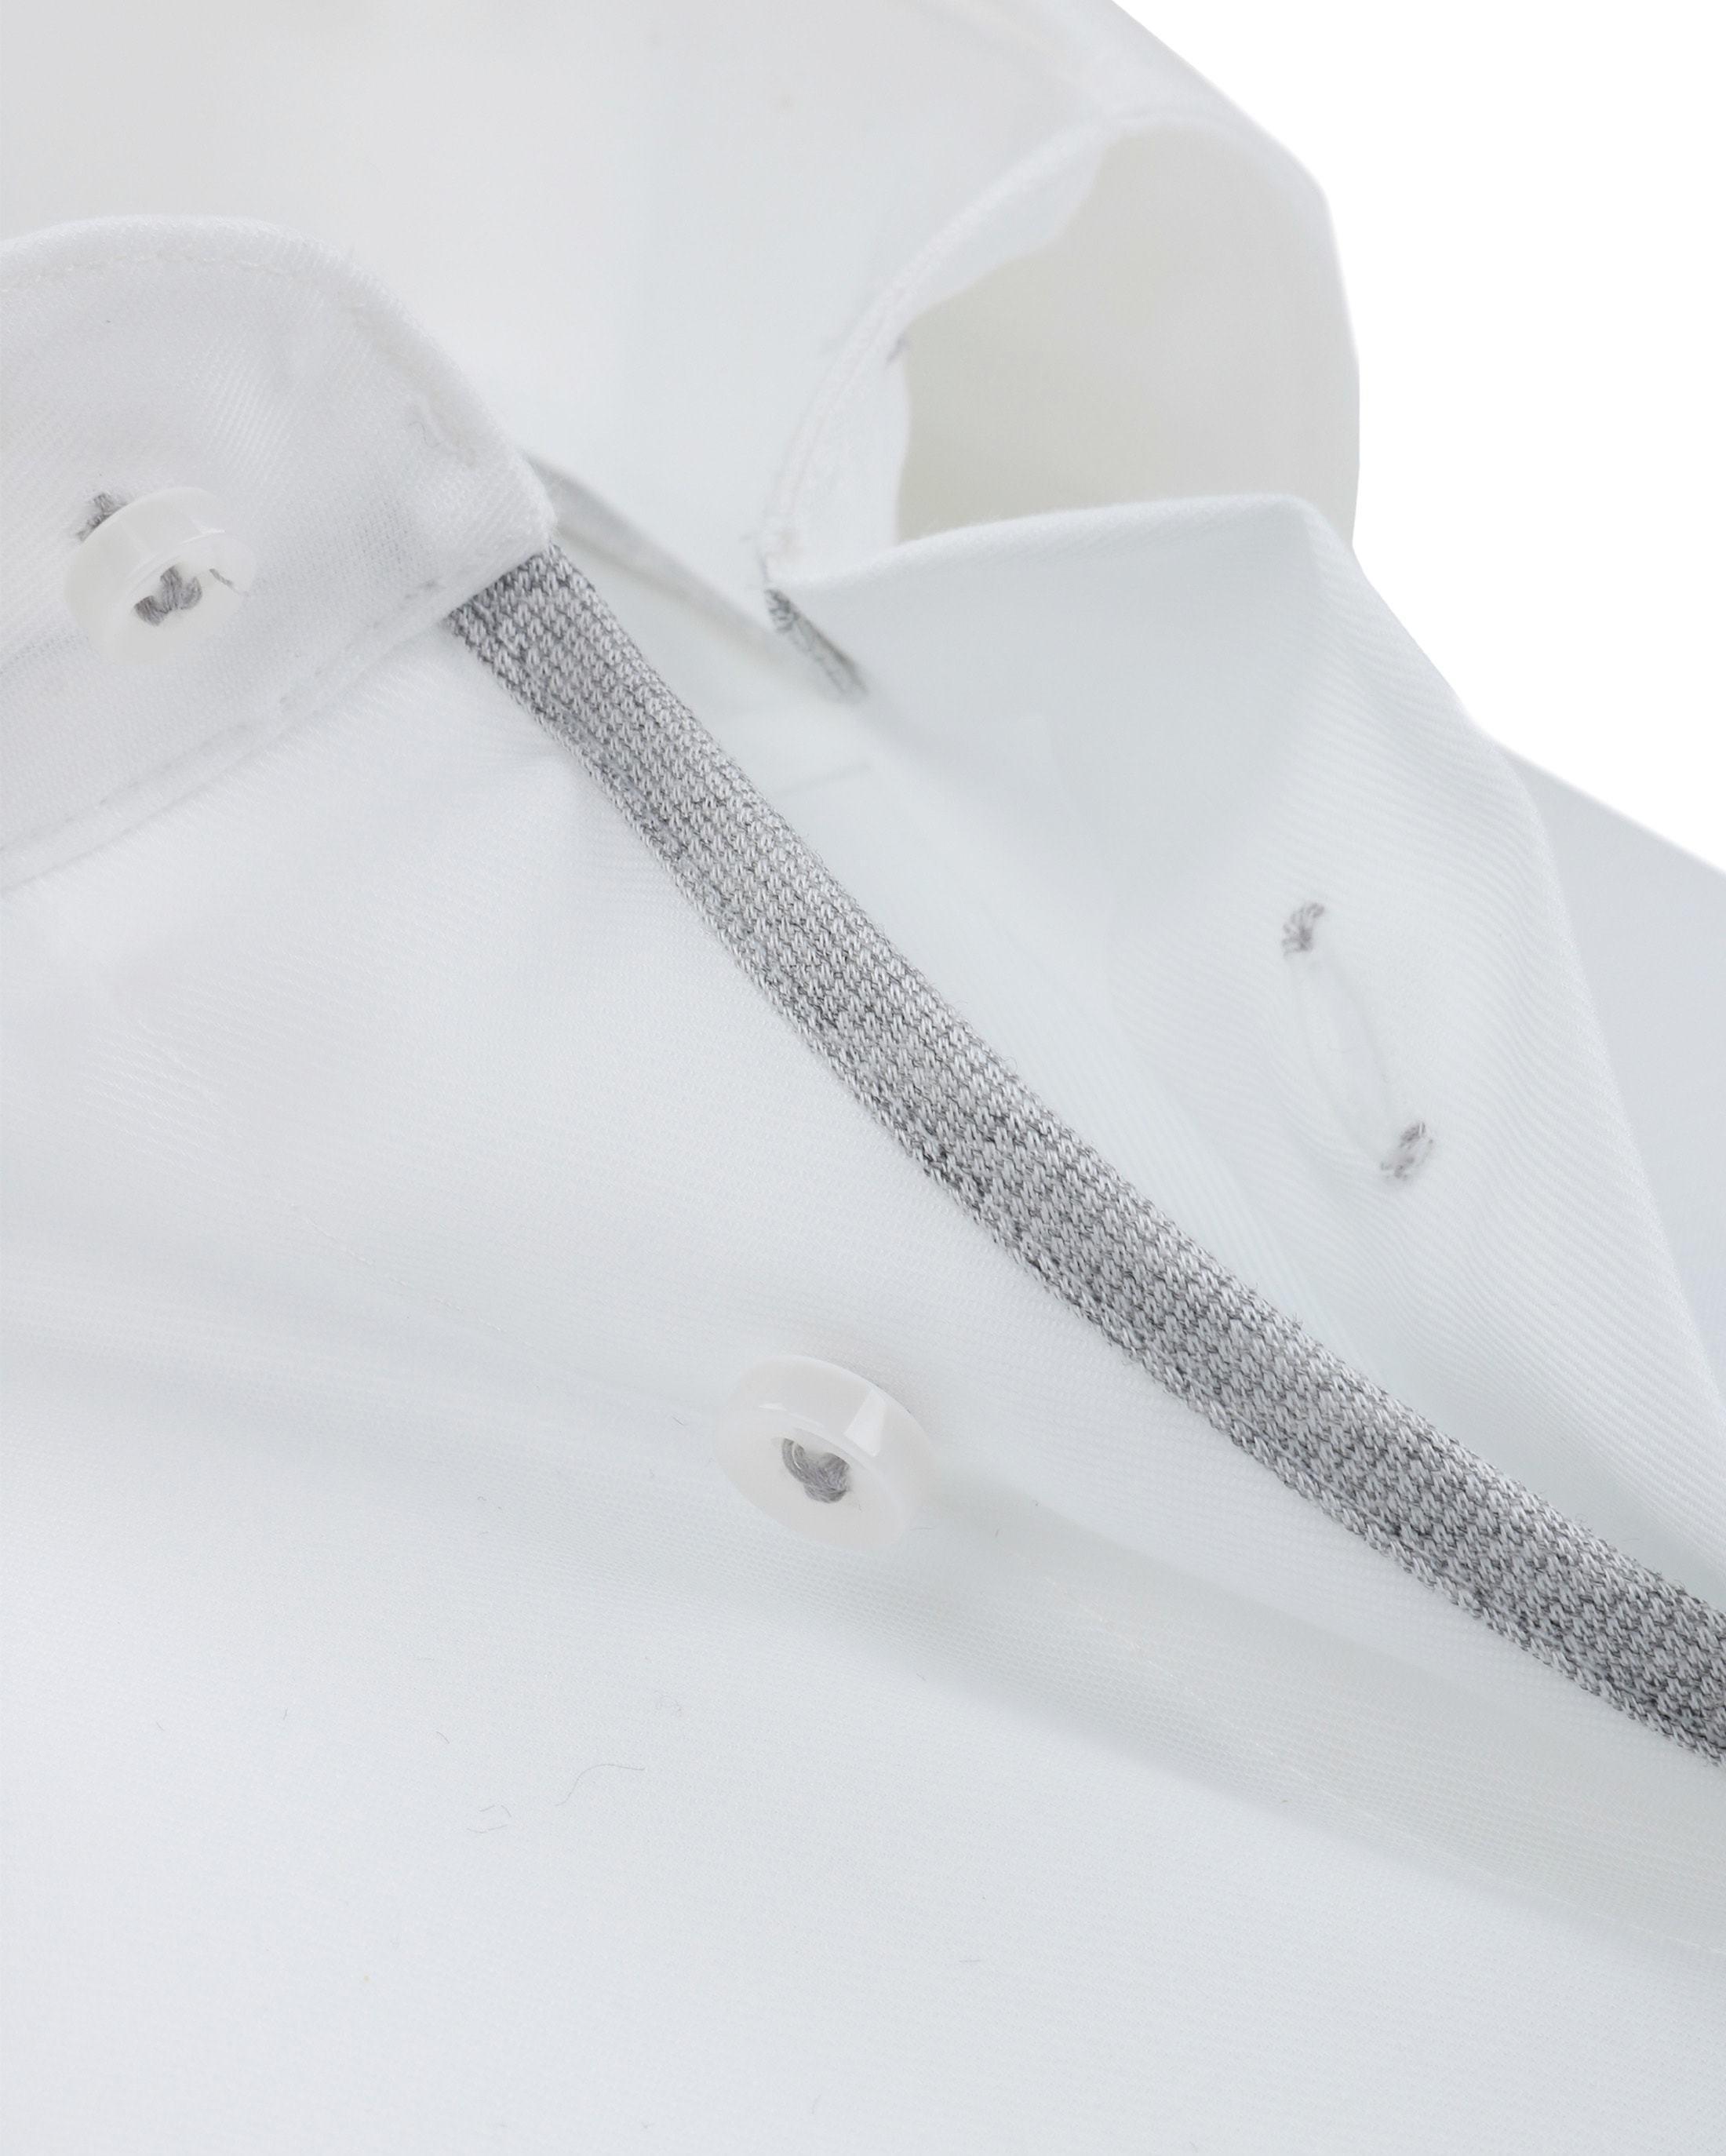 Profuomo Overhemd Strijkvrij Wit Grijs foto 1